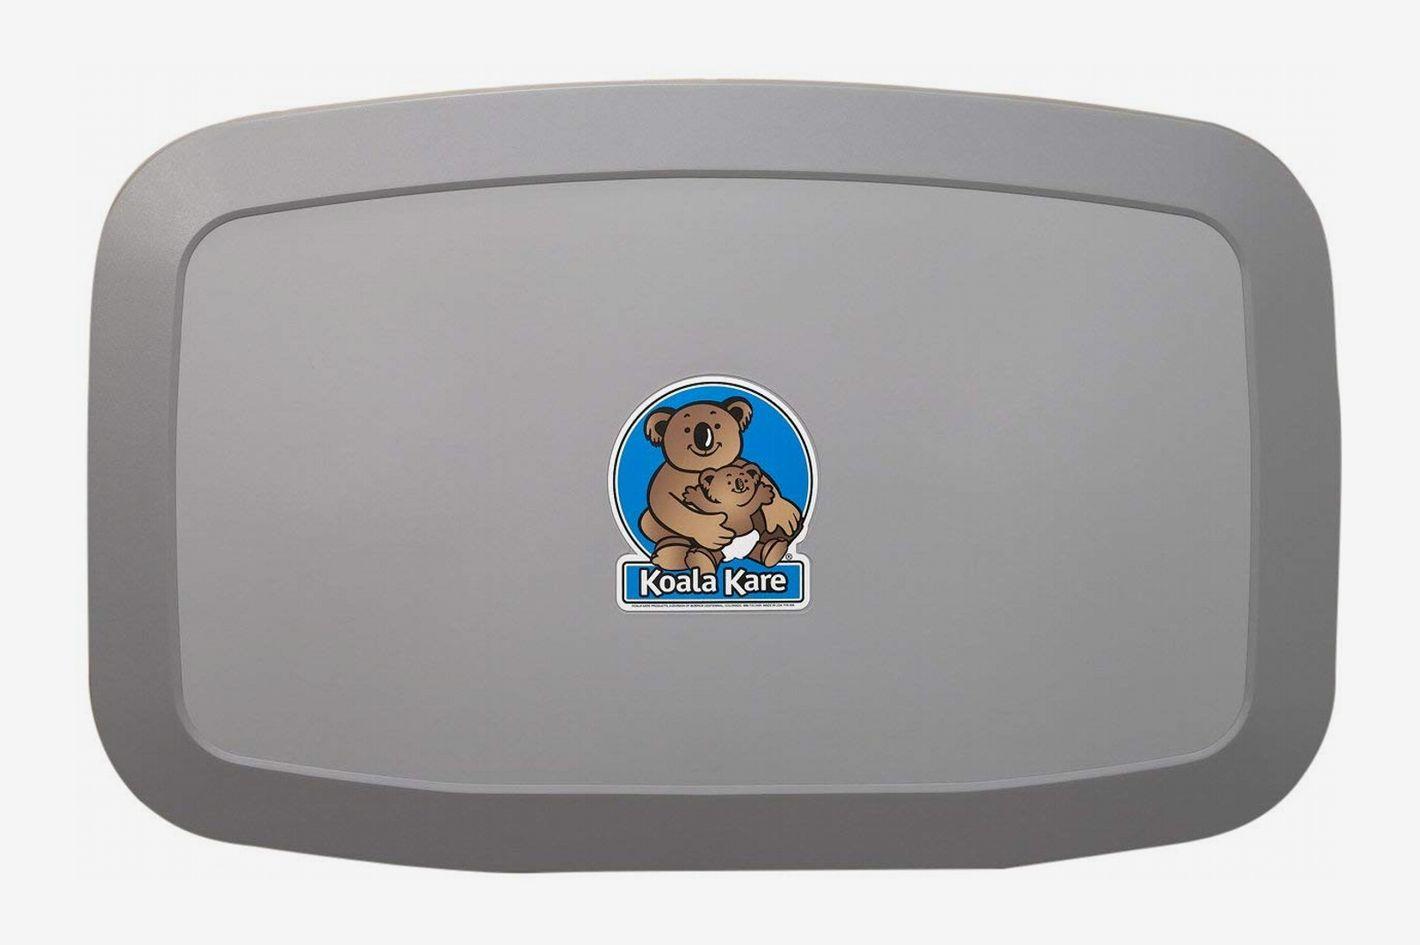 Koala Kare KB200-01 Horizontal Wall Mounted Baby Changing Station